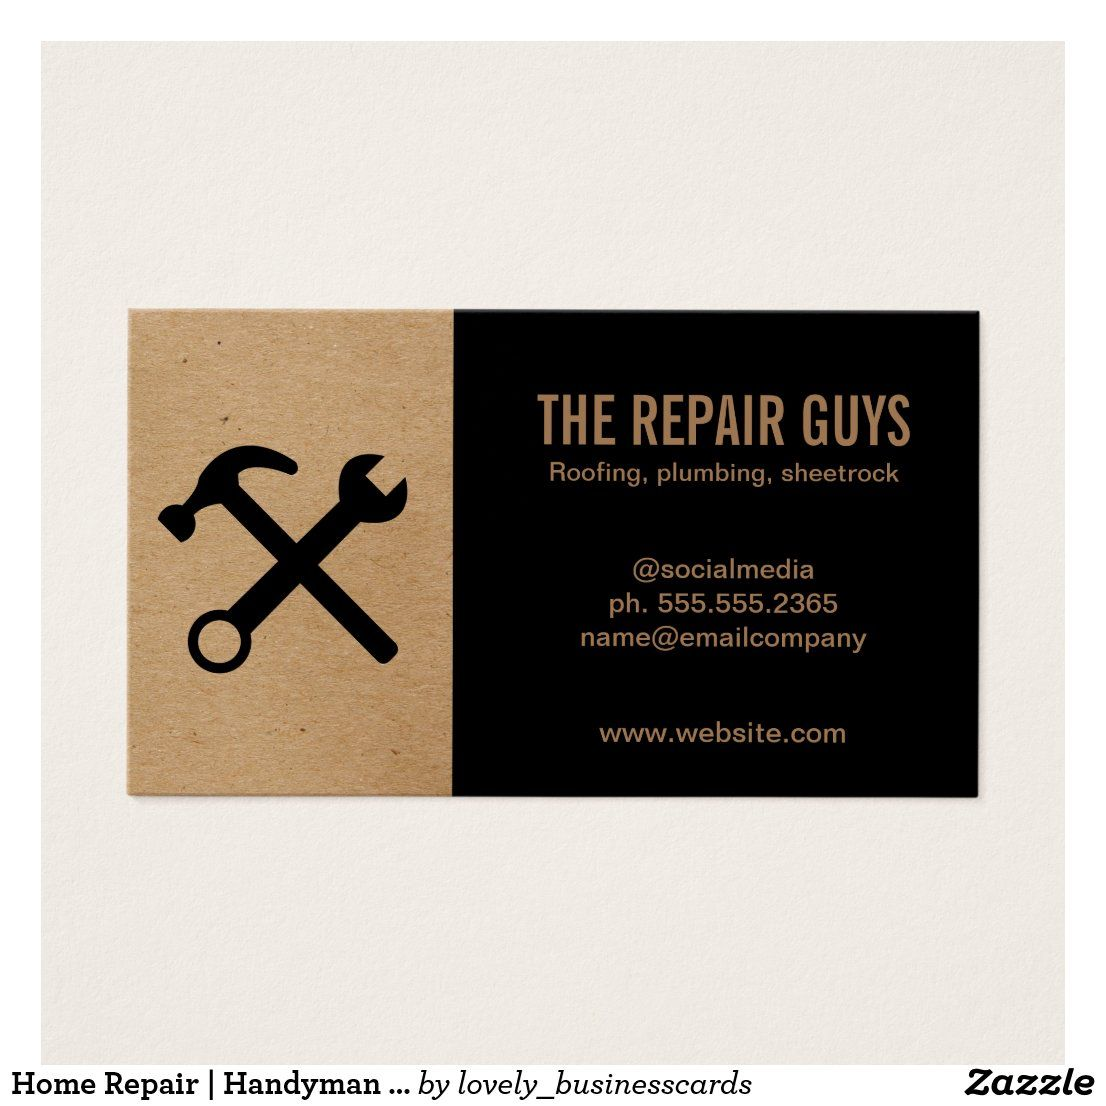 Home Repair Handyman Construction in 2020